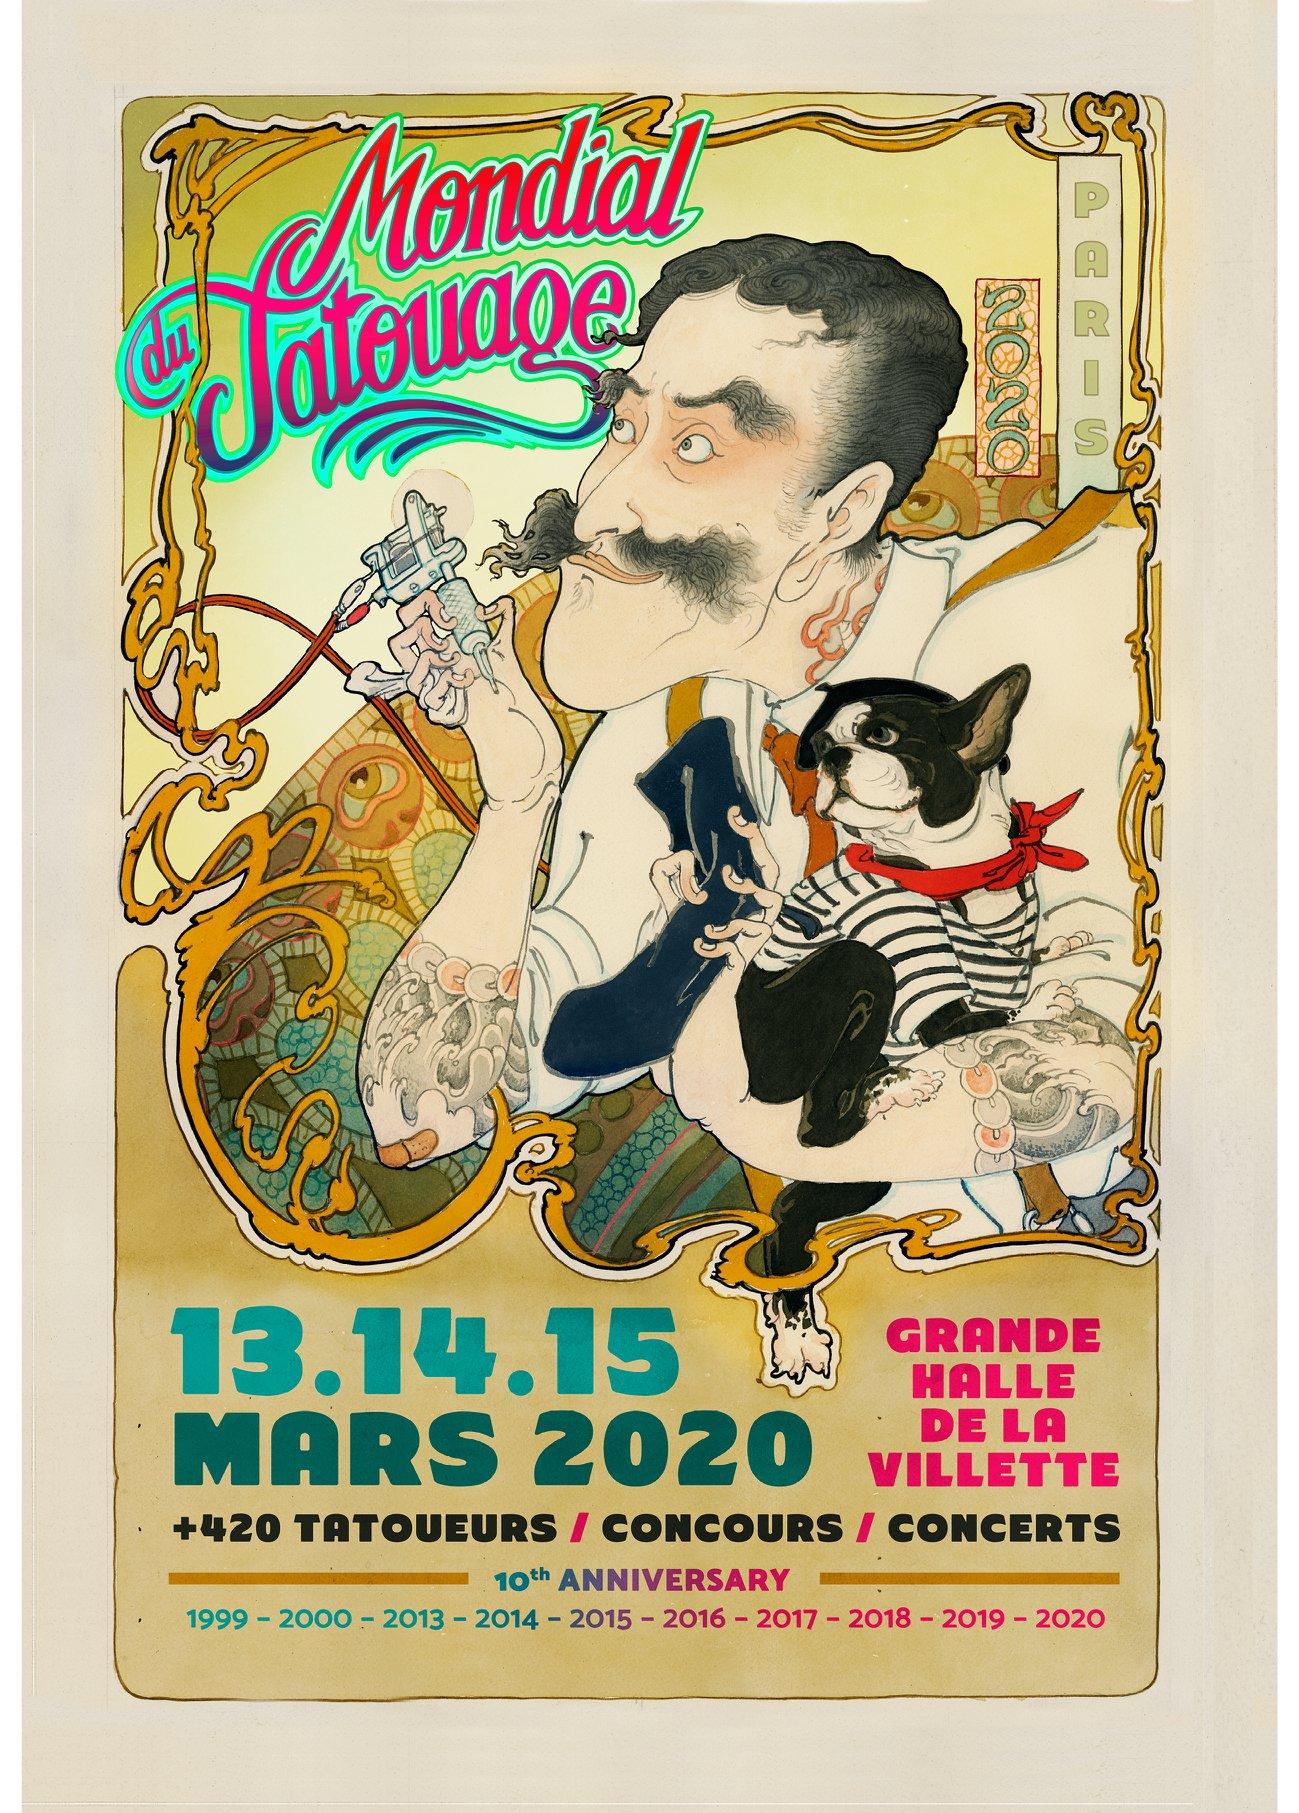 Paris World Tattoo Convention: Le Mondial du Tatouage